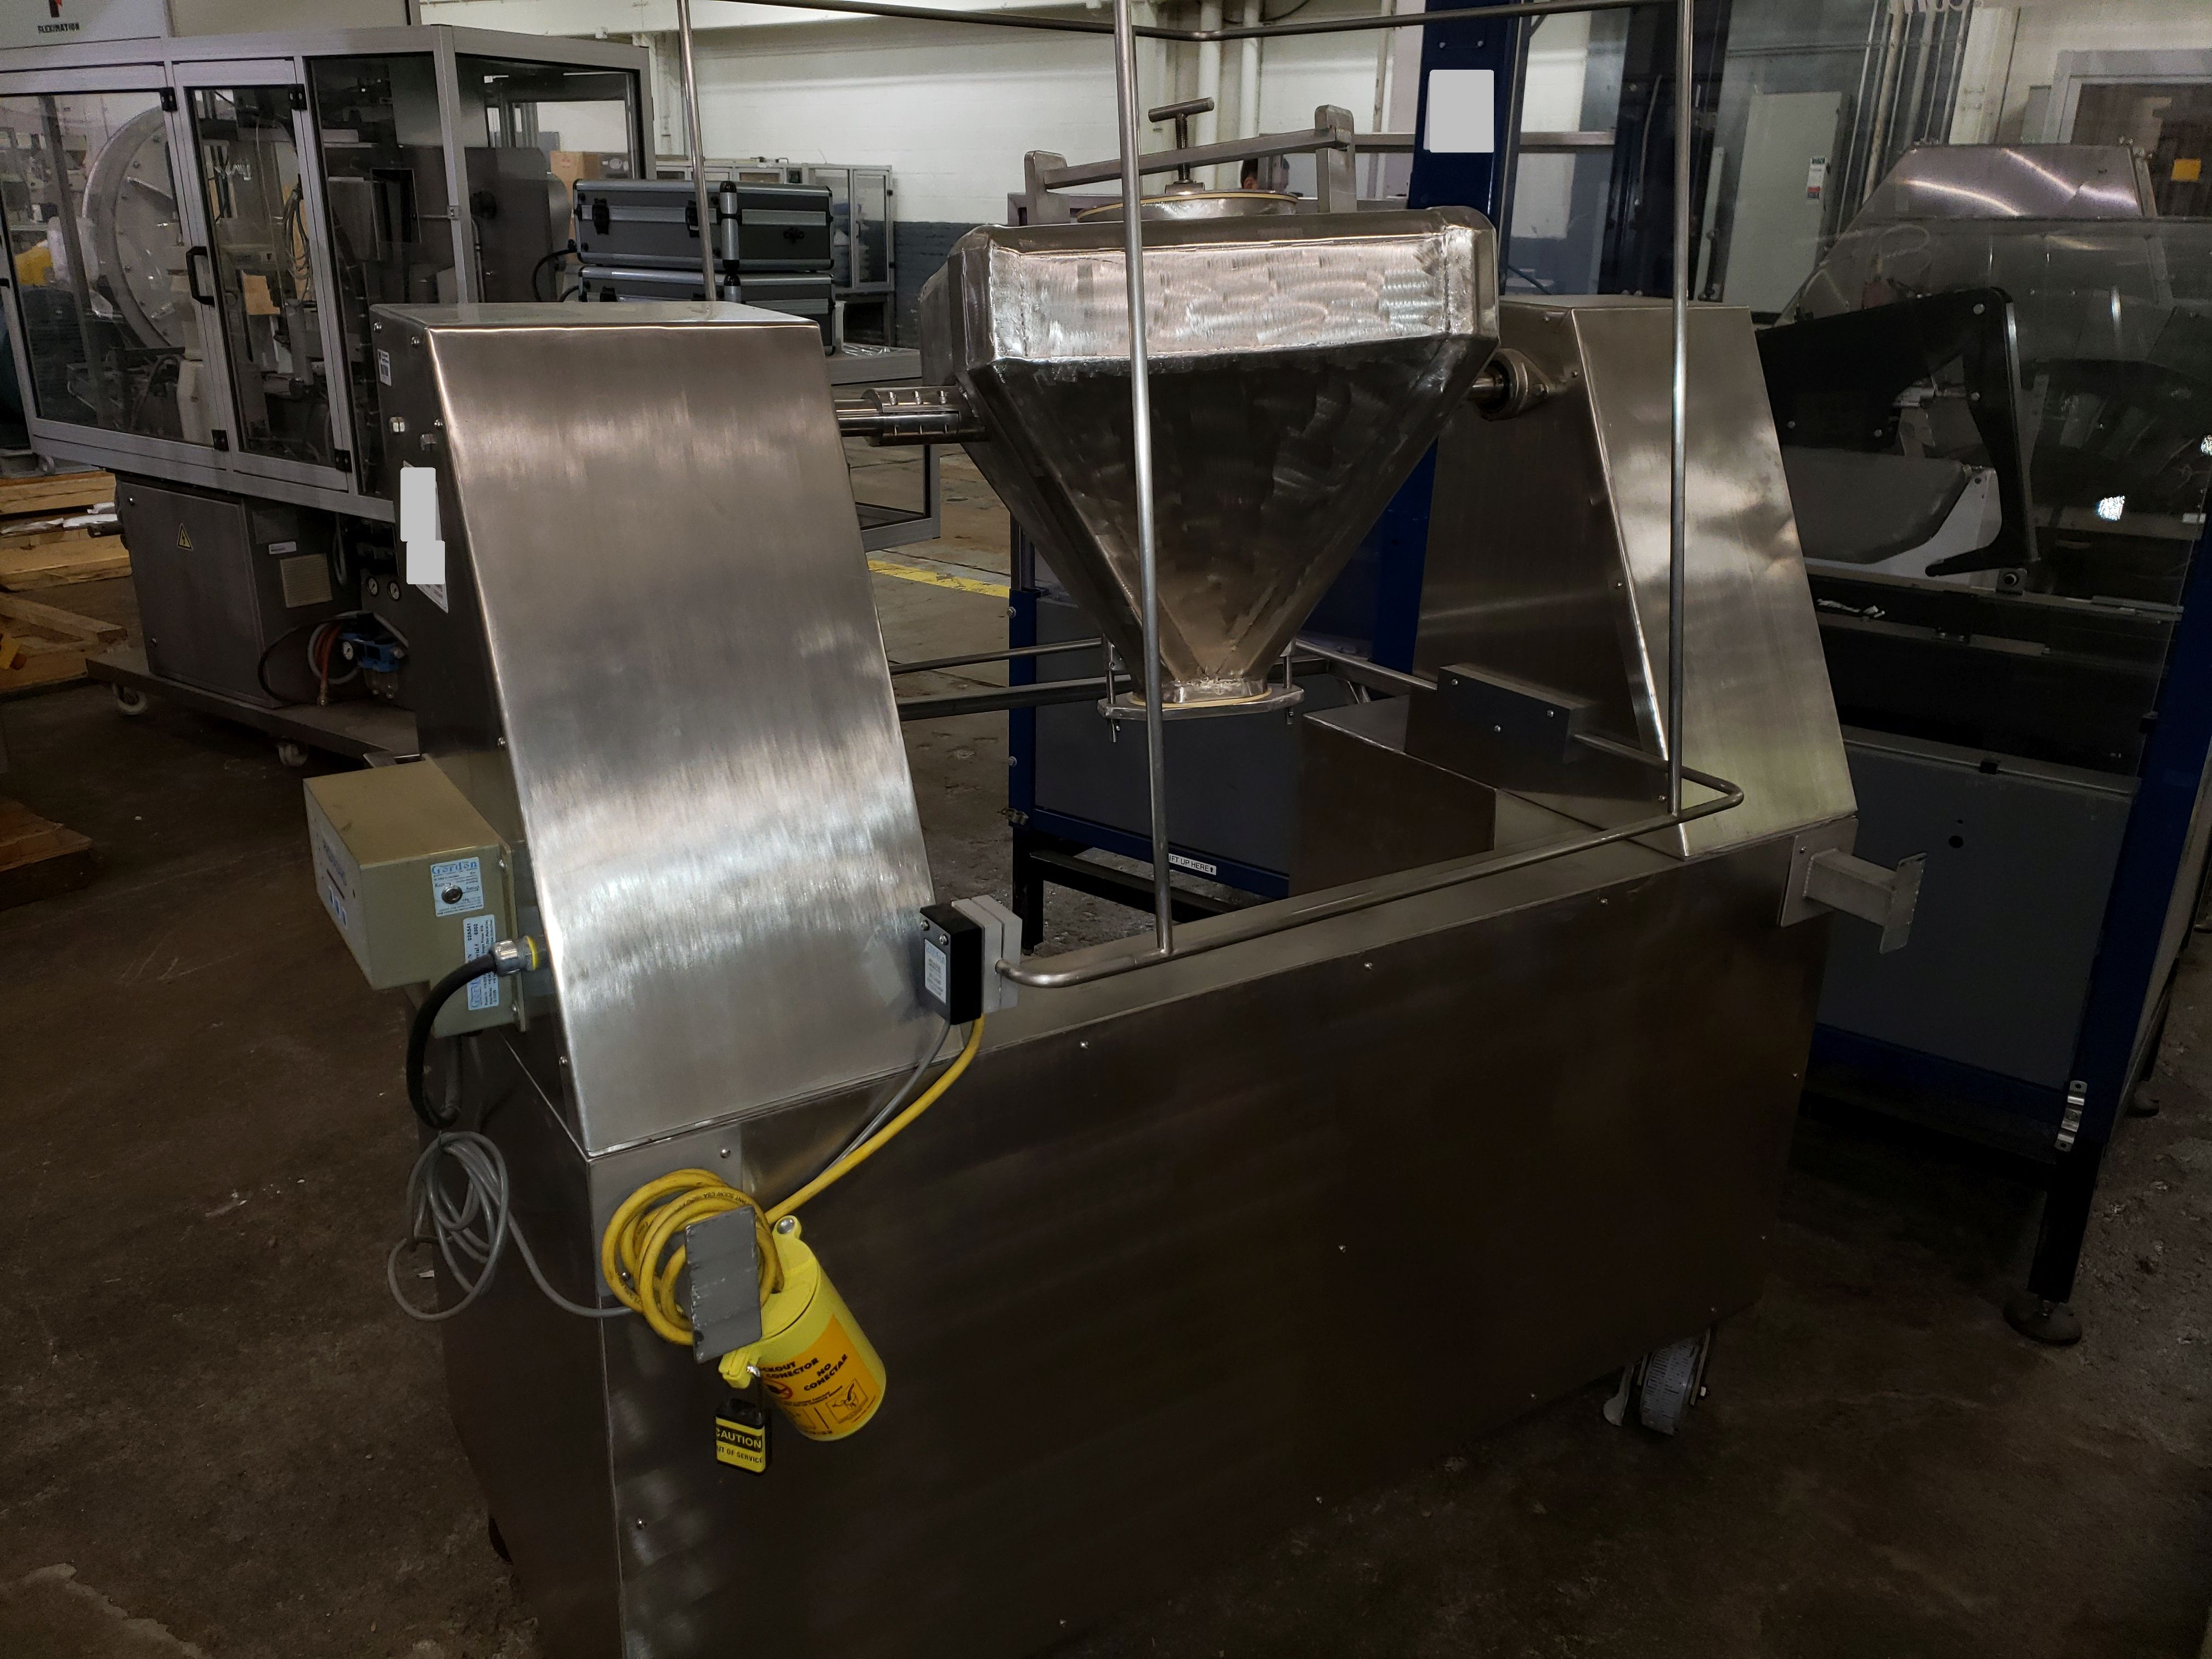 0.75 cu ft blender, stainless steel construction